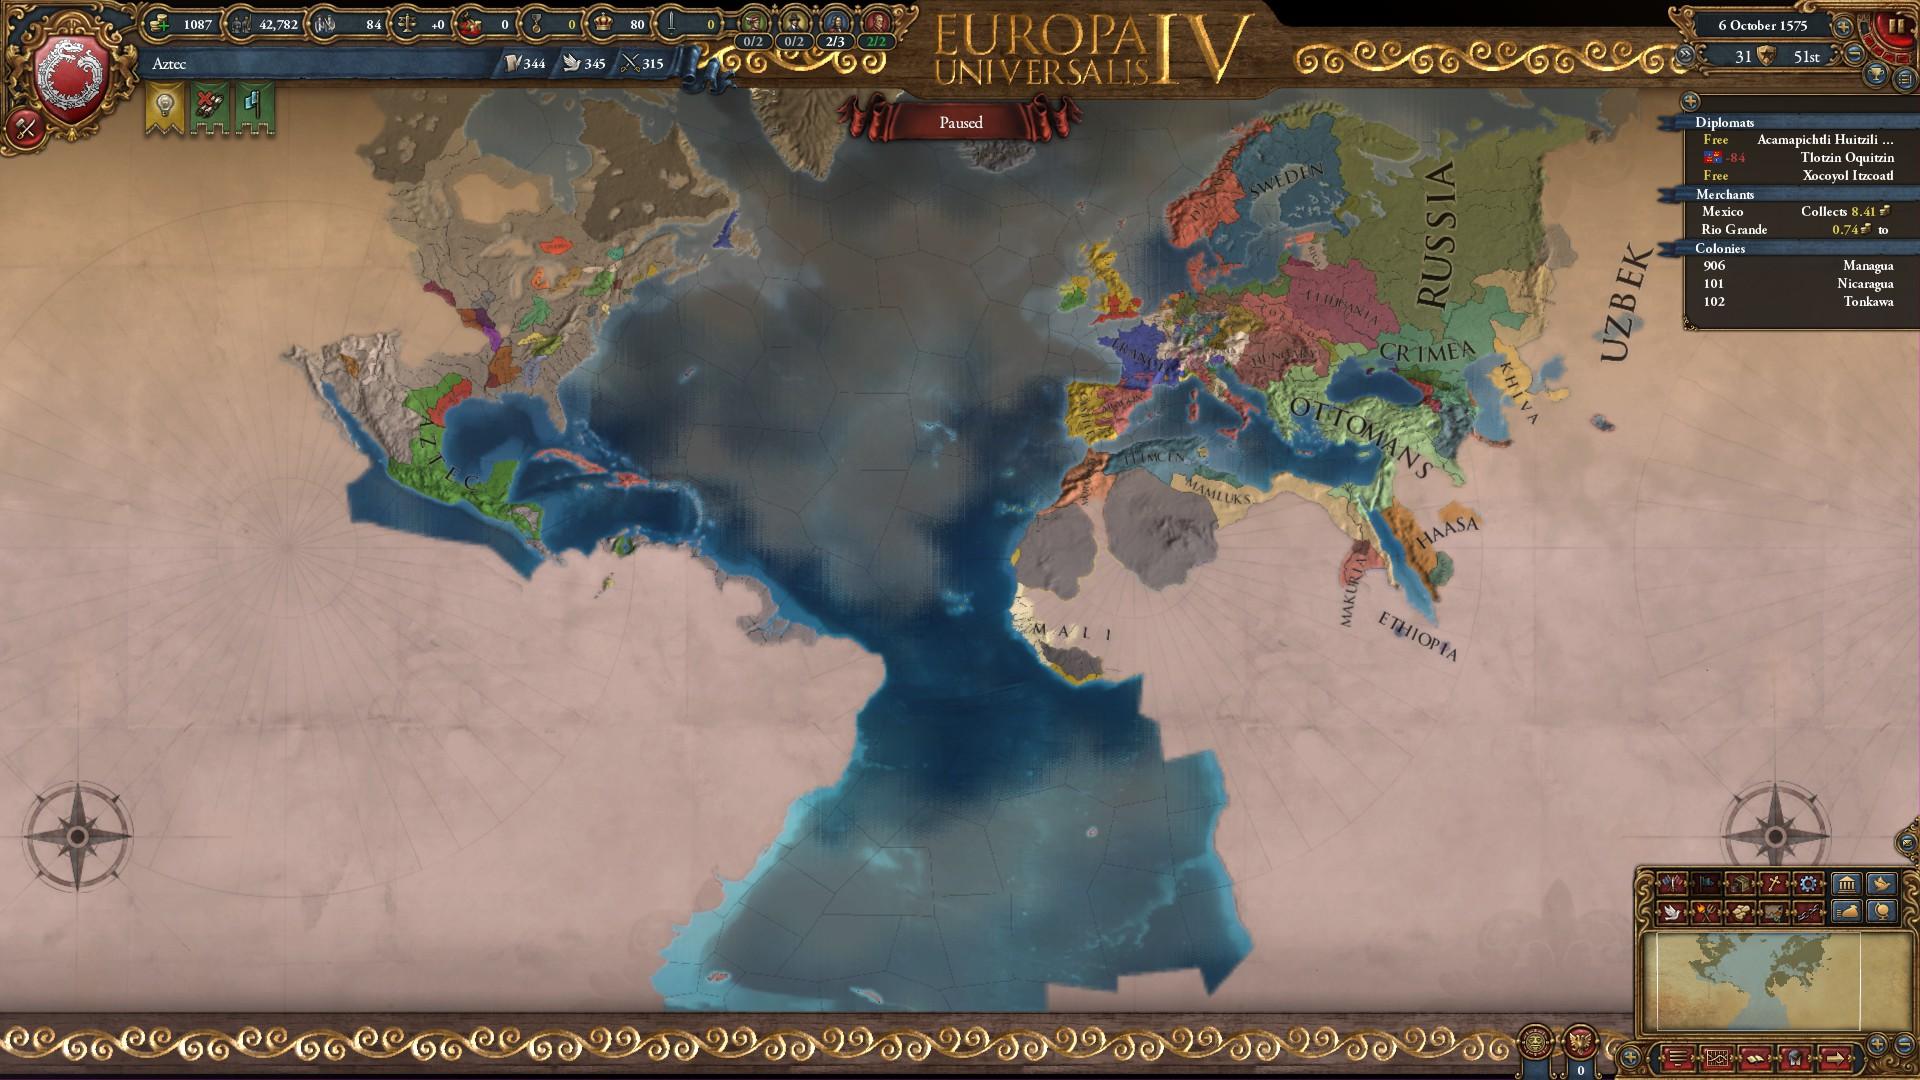 Aztec technology or development | Paradox Interactive Forums